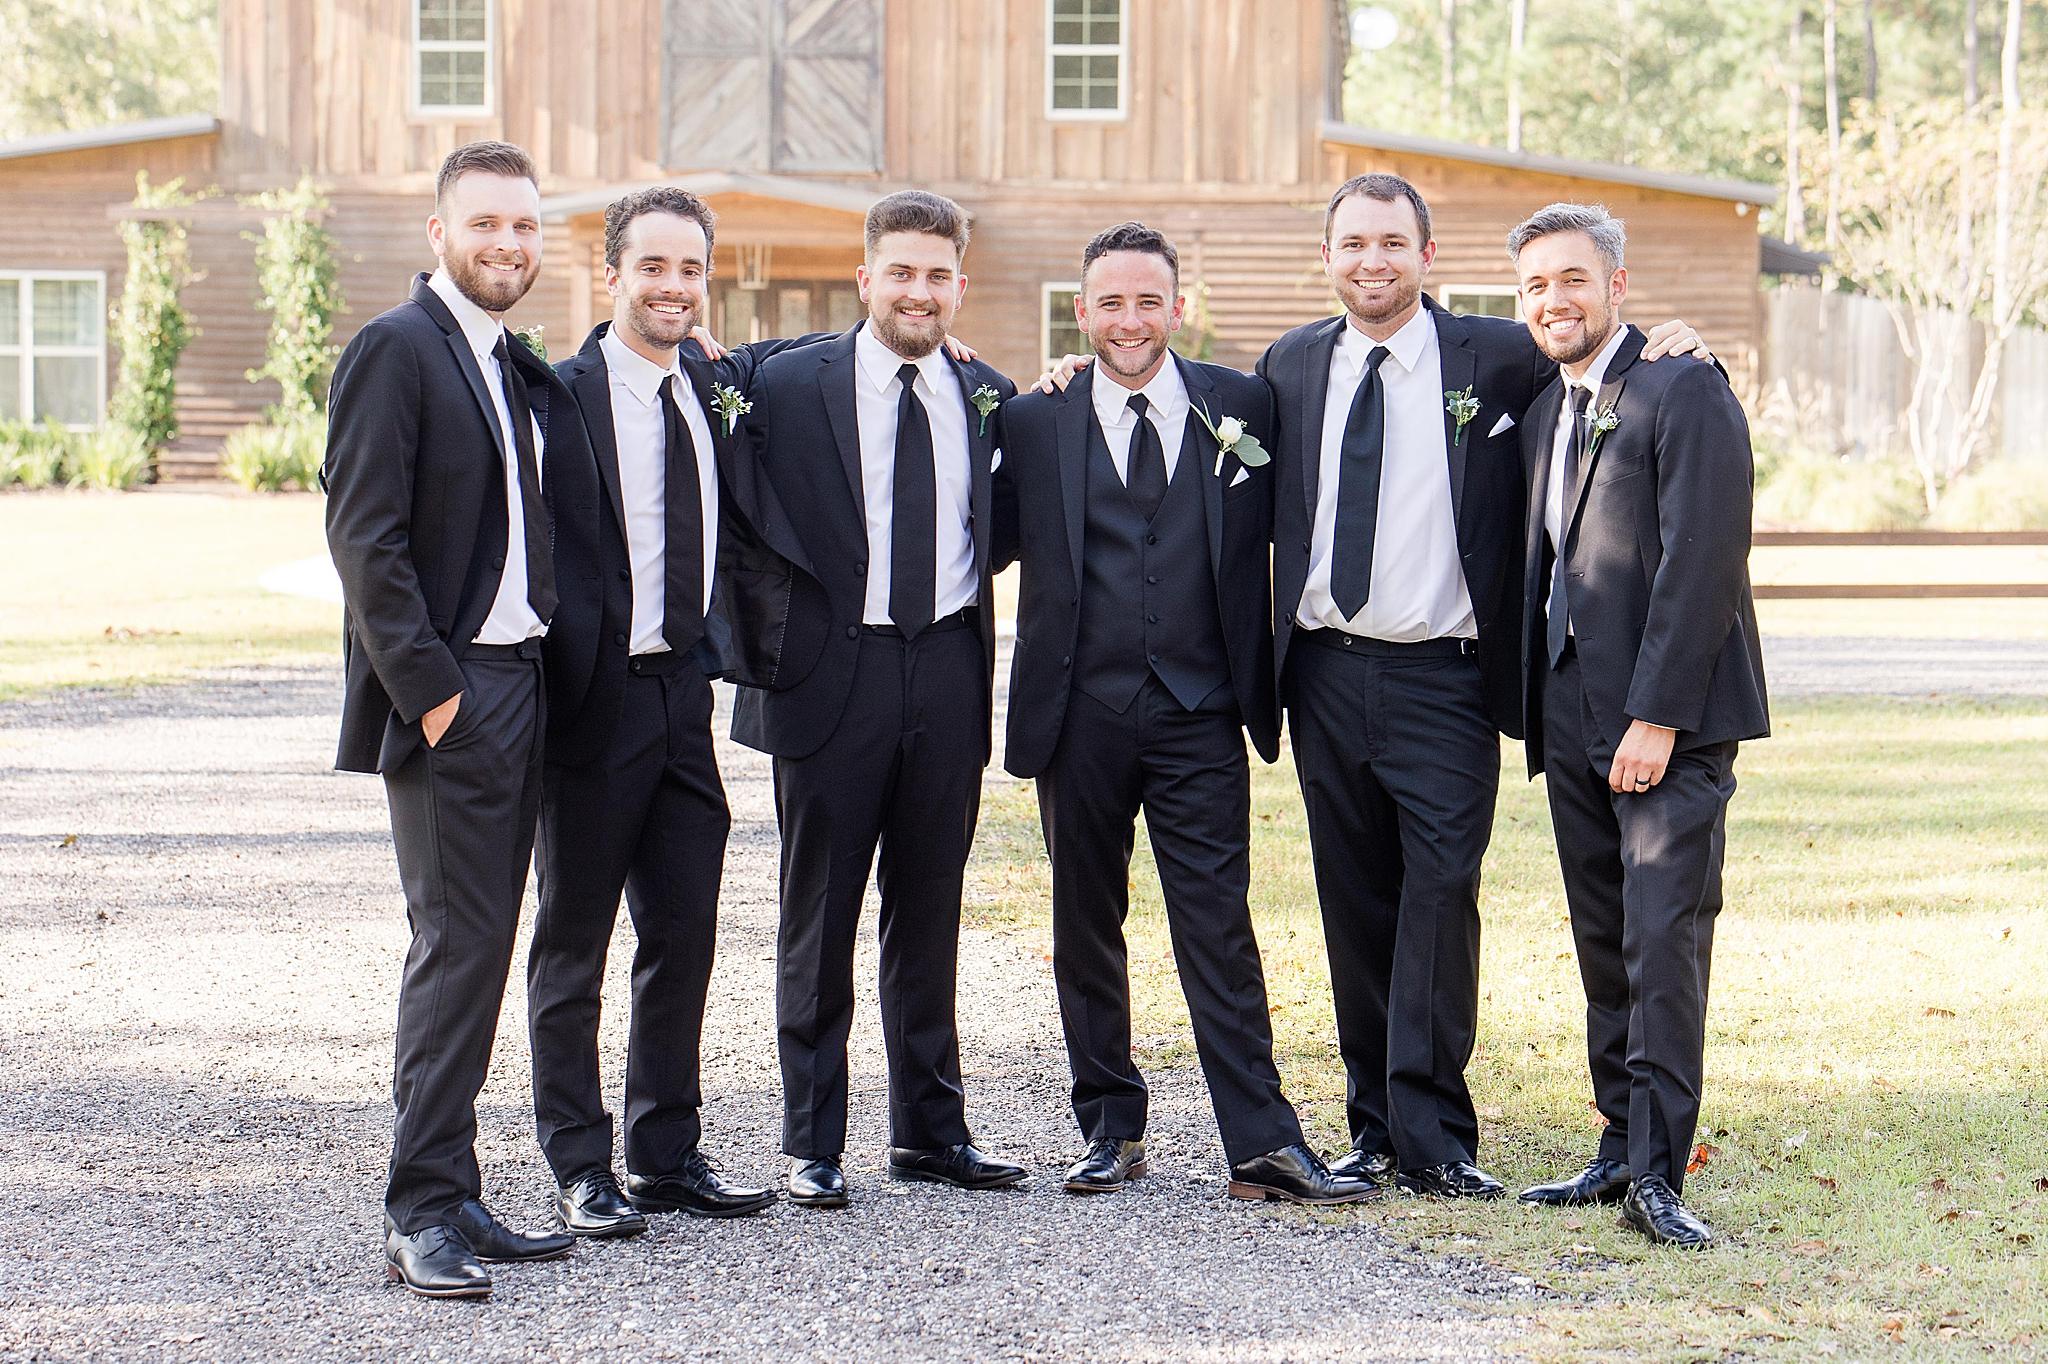 groom and groomsmen pose before Izenstone wedding